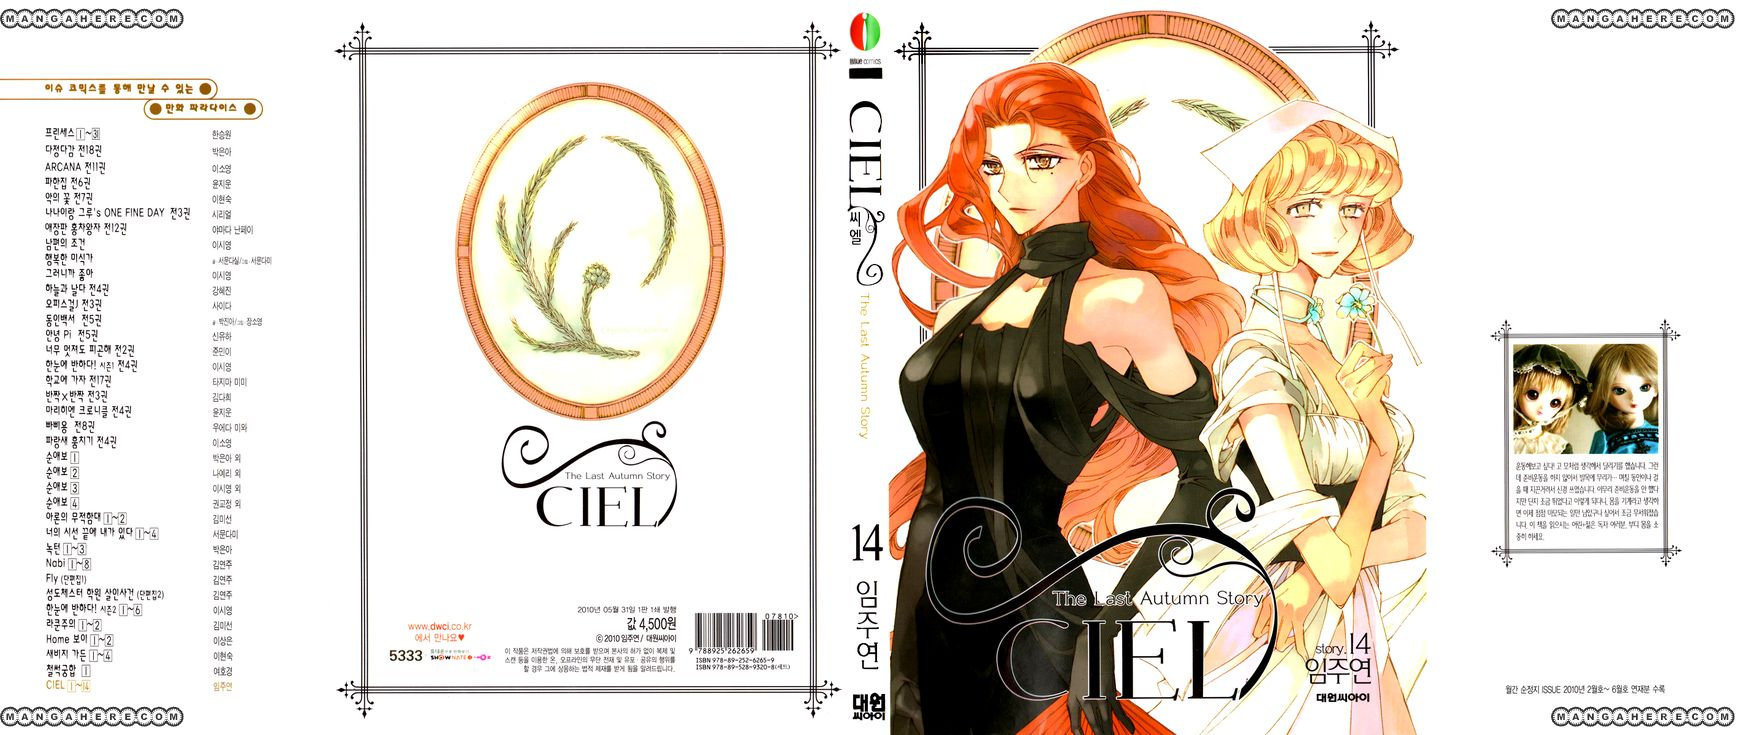 Ciel~the Last Autumn Story~ 13.9 Page 2